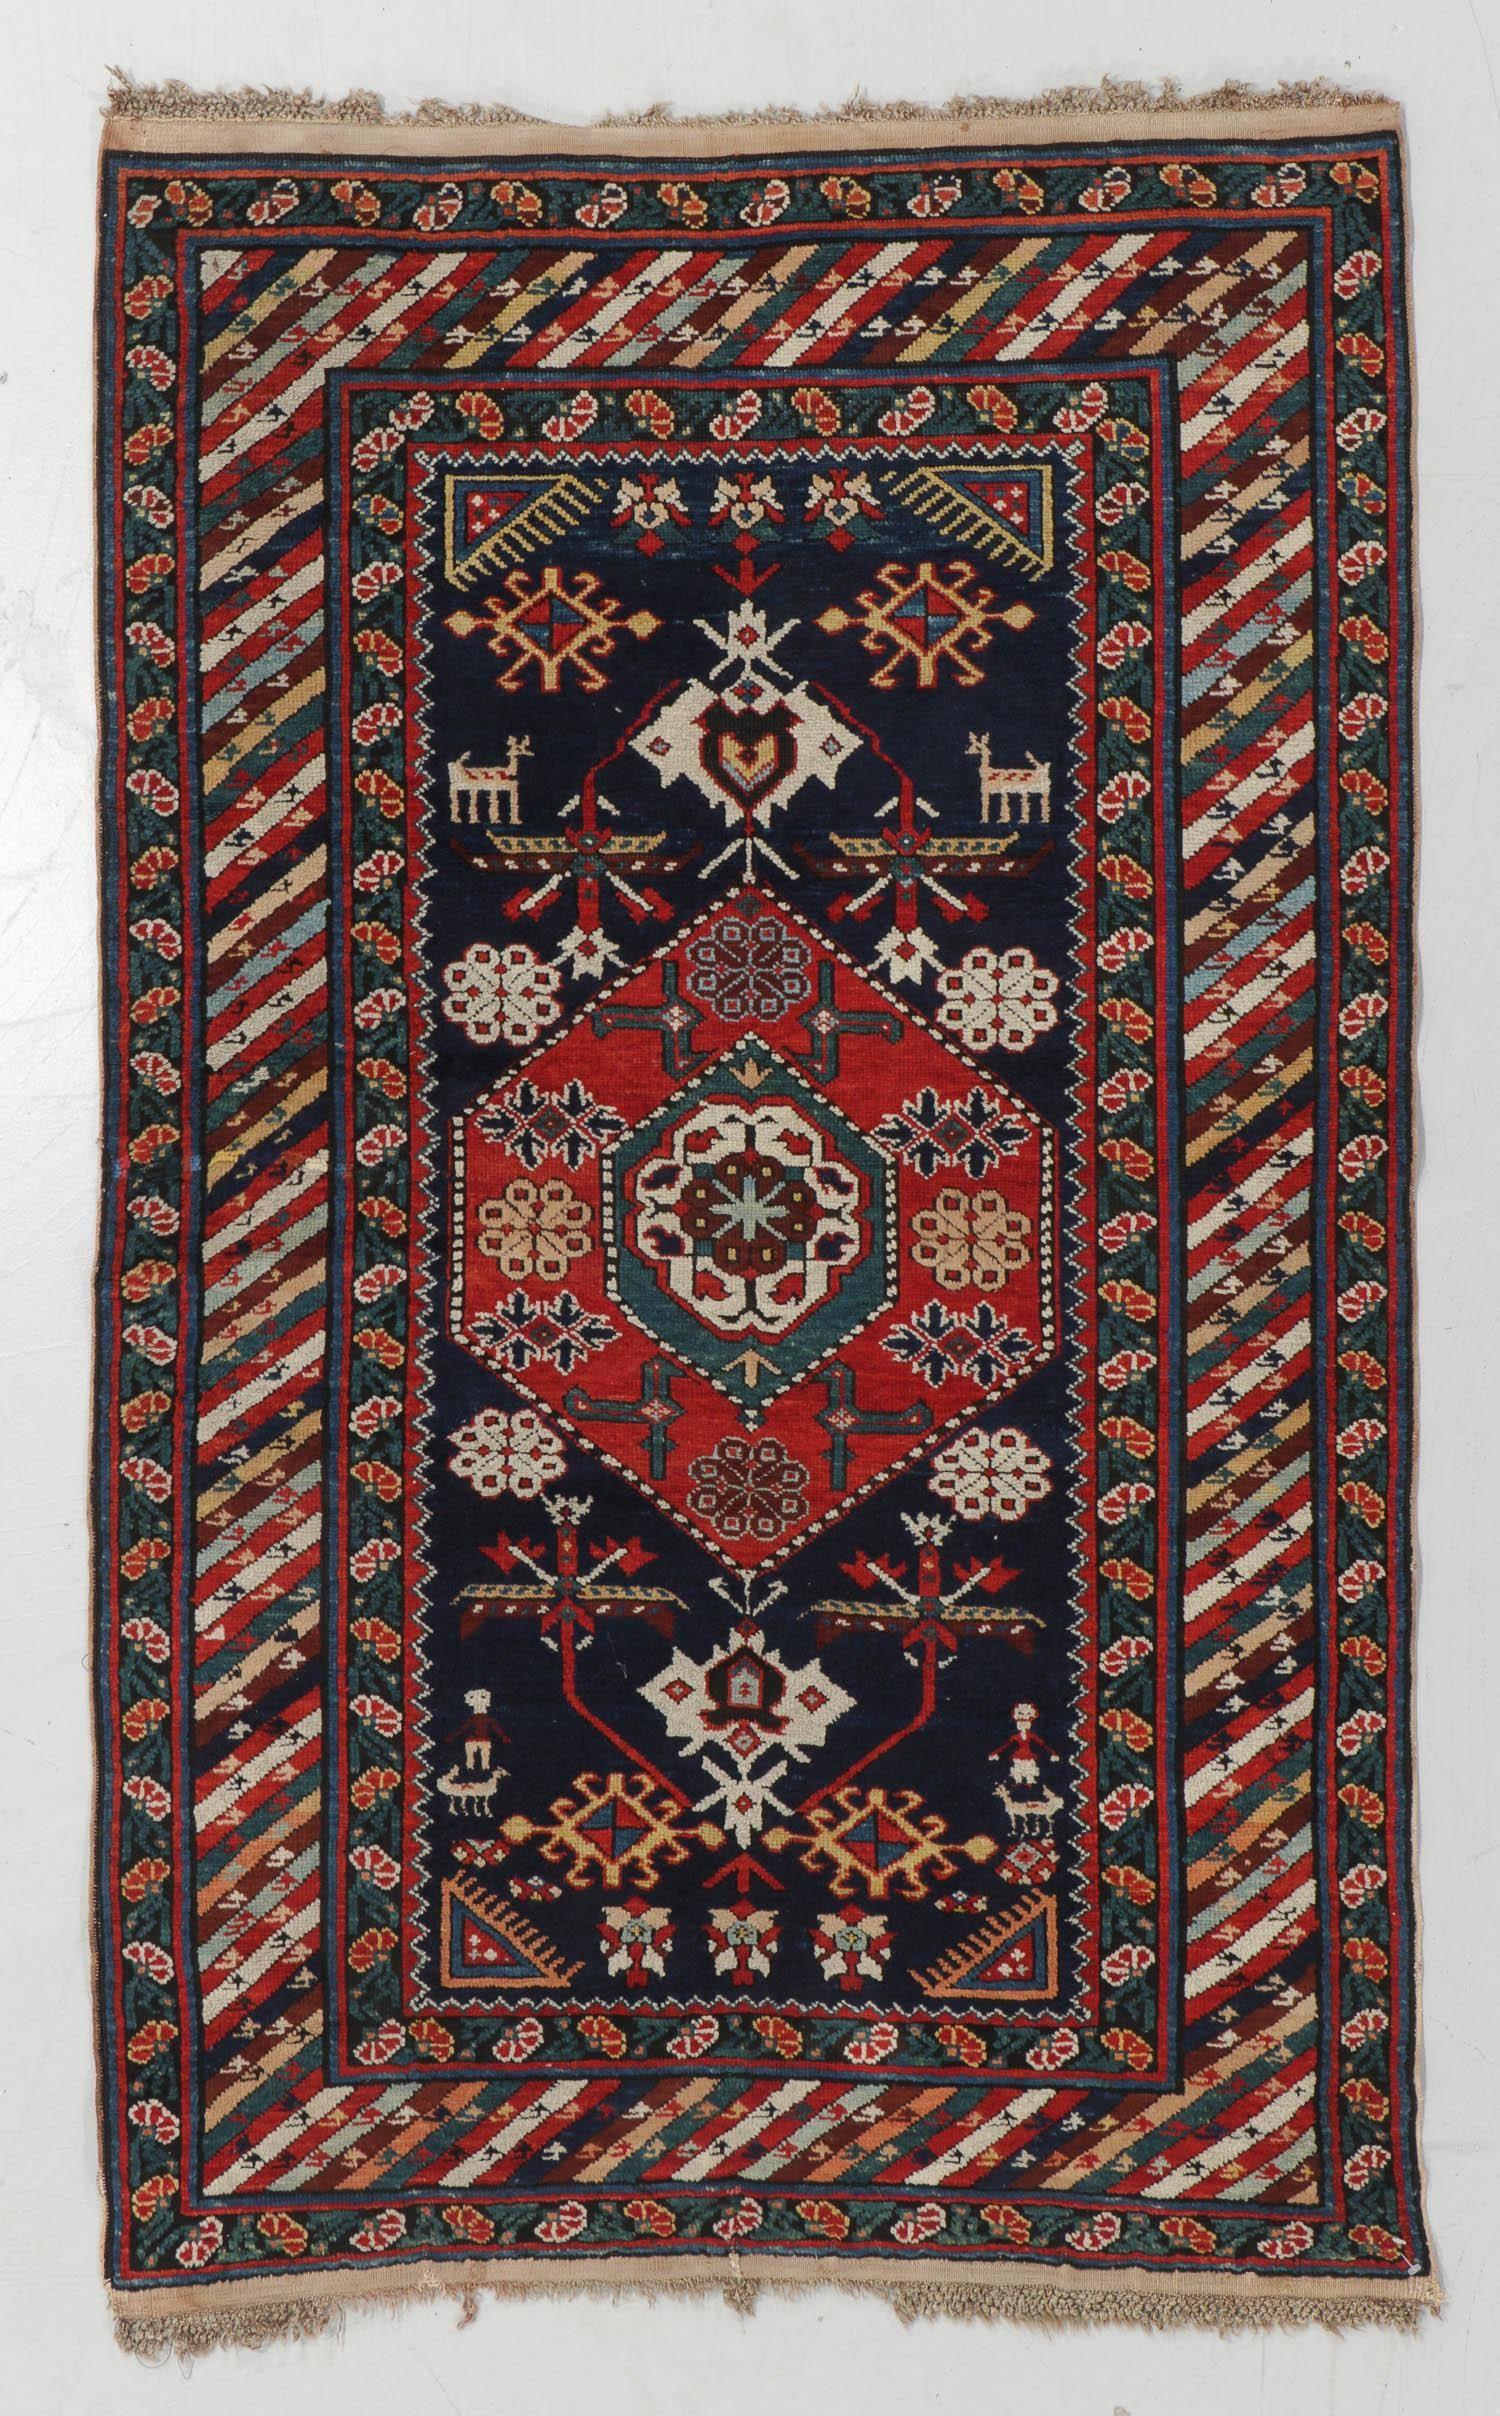 Kuba Rug, Caucasus, Circa 1880, 3'6'' x 5'9''